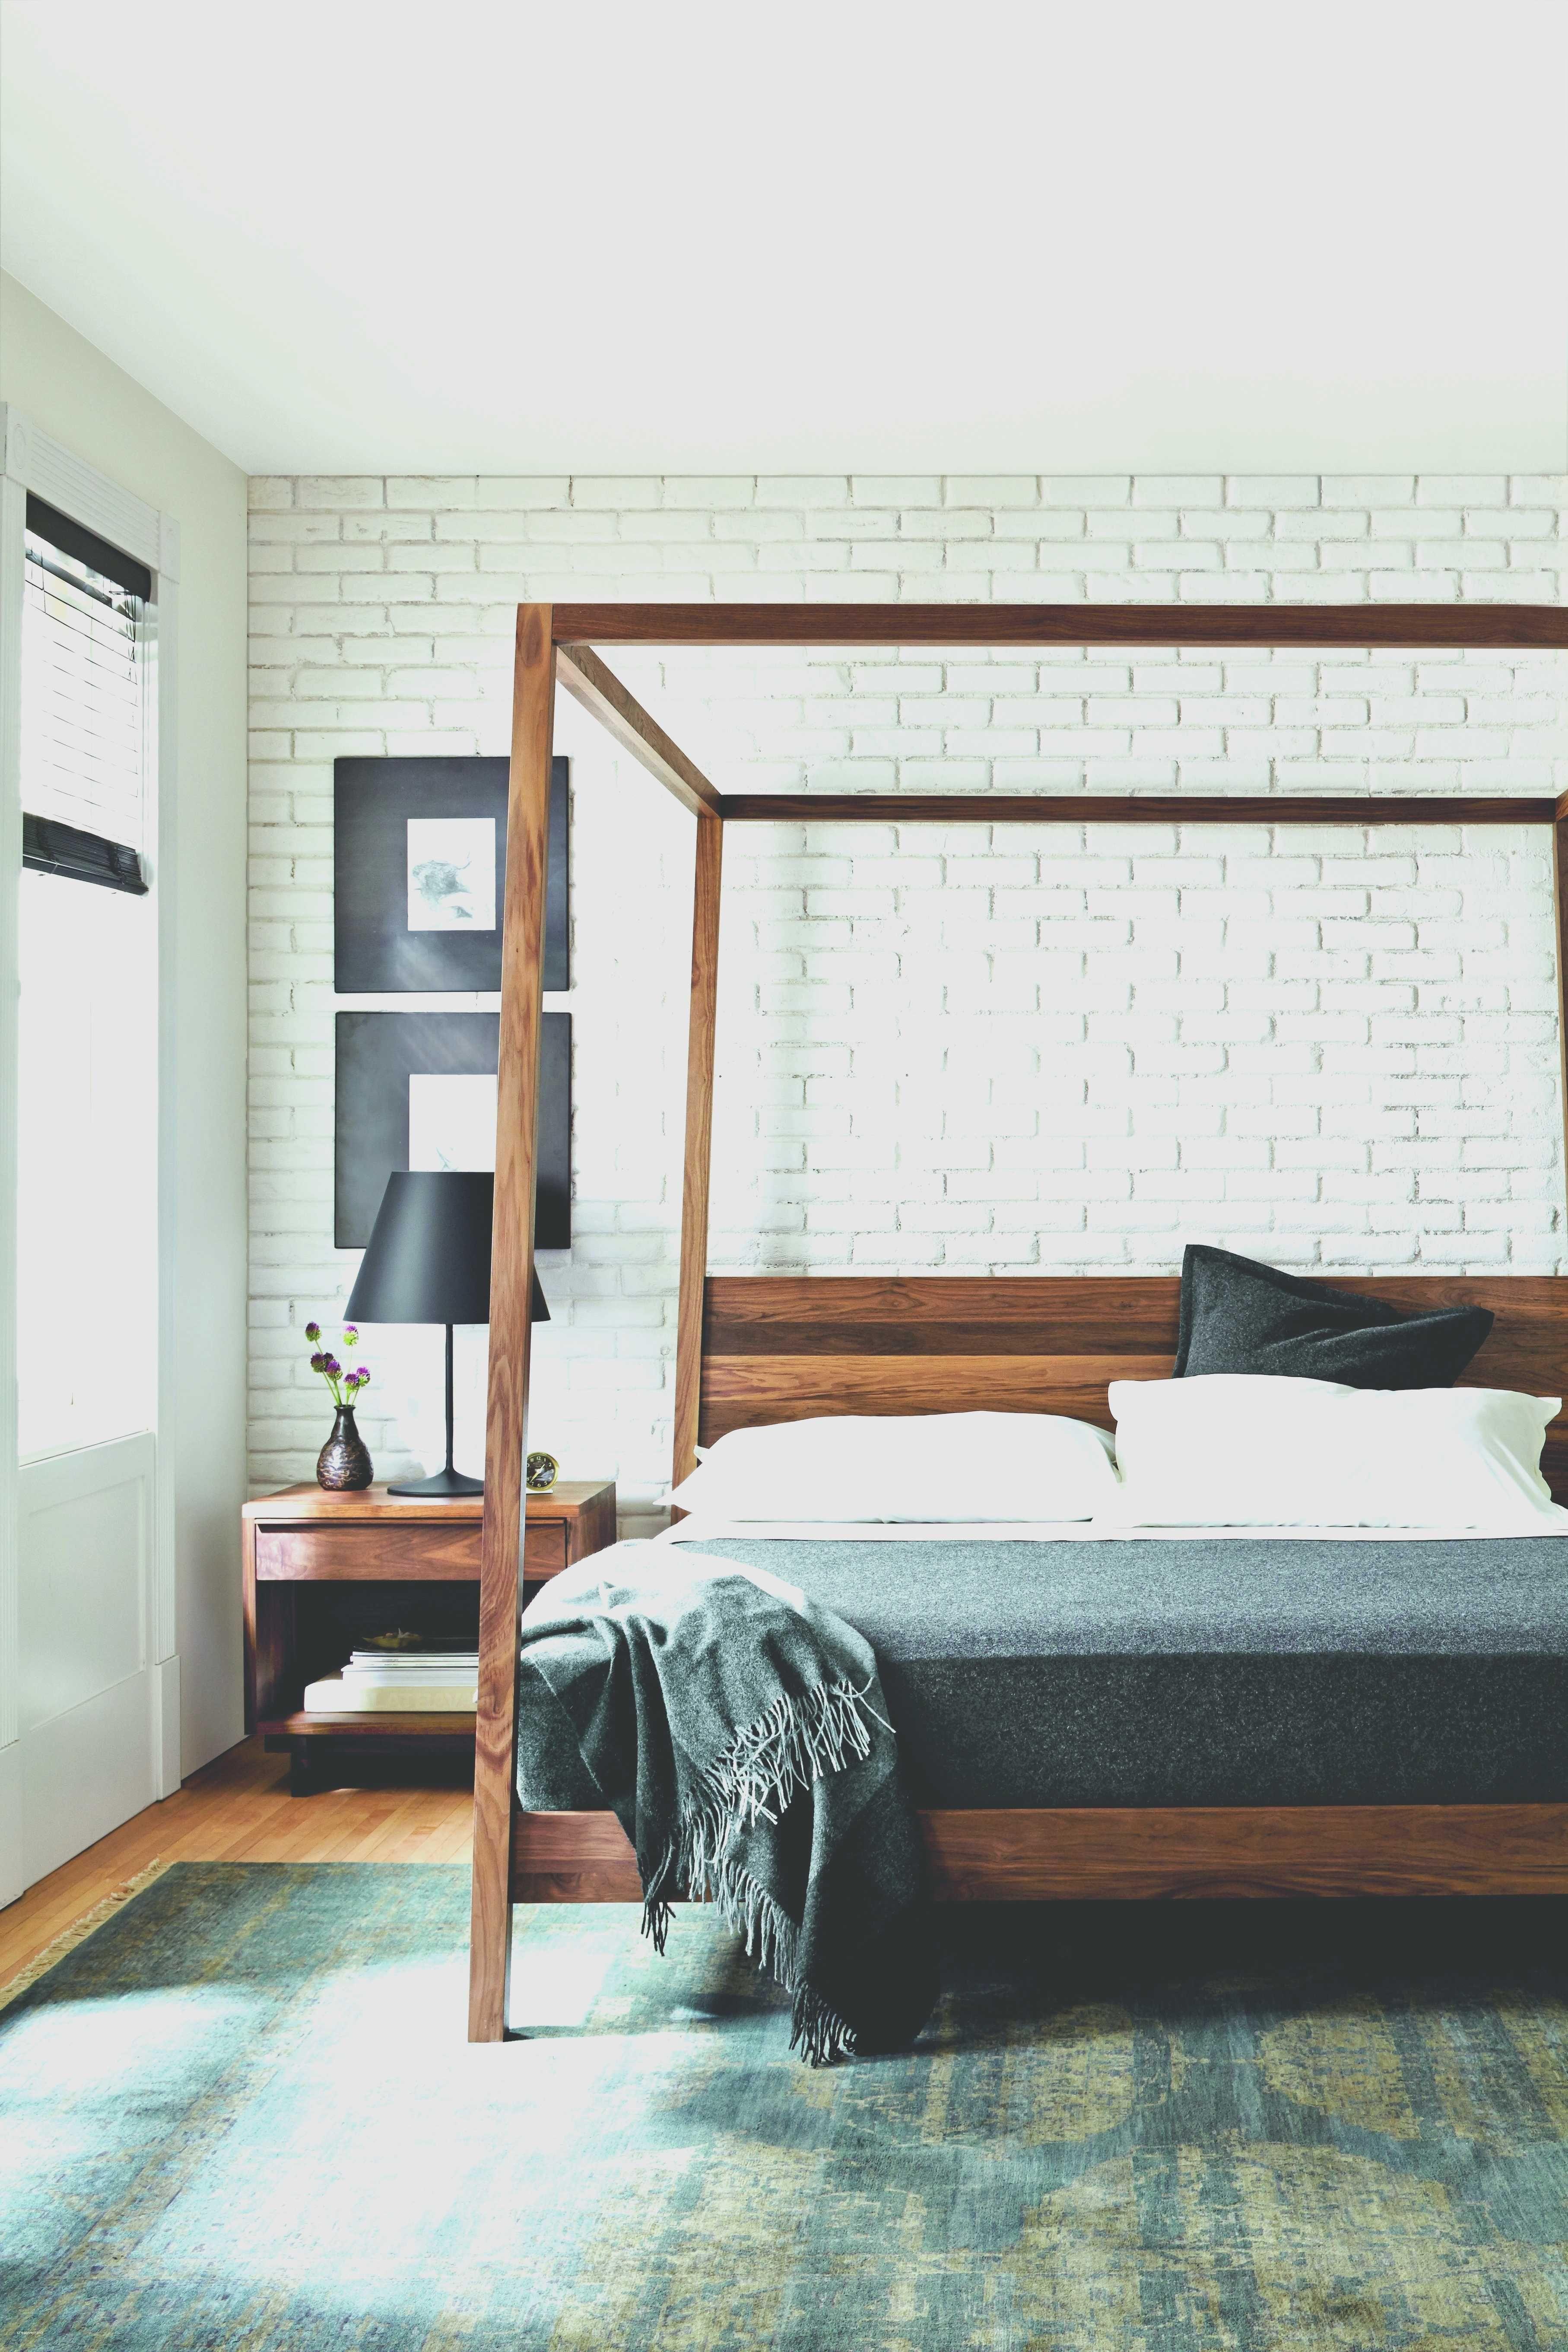 Pin On Wall Decor Bedroom Ideas